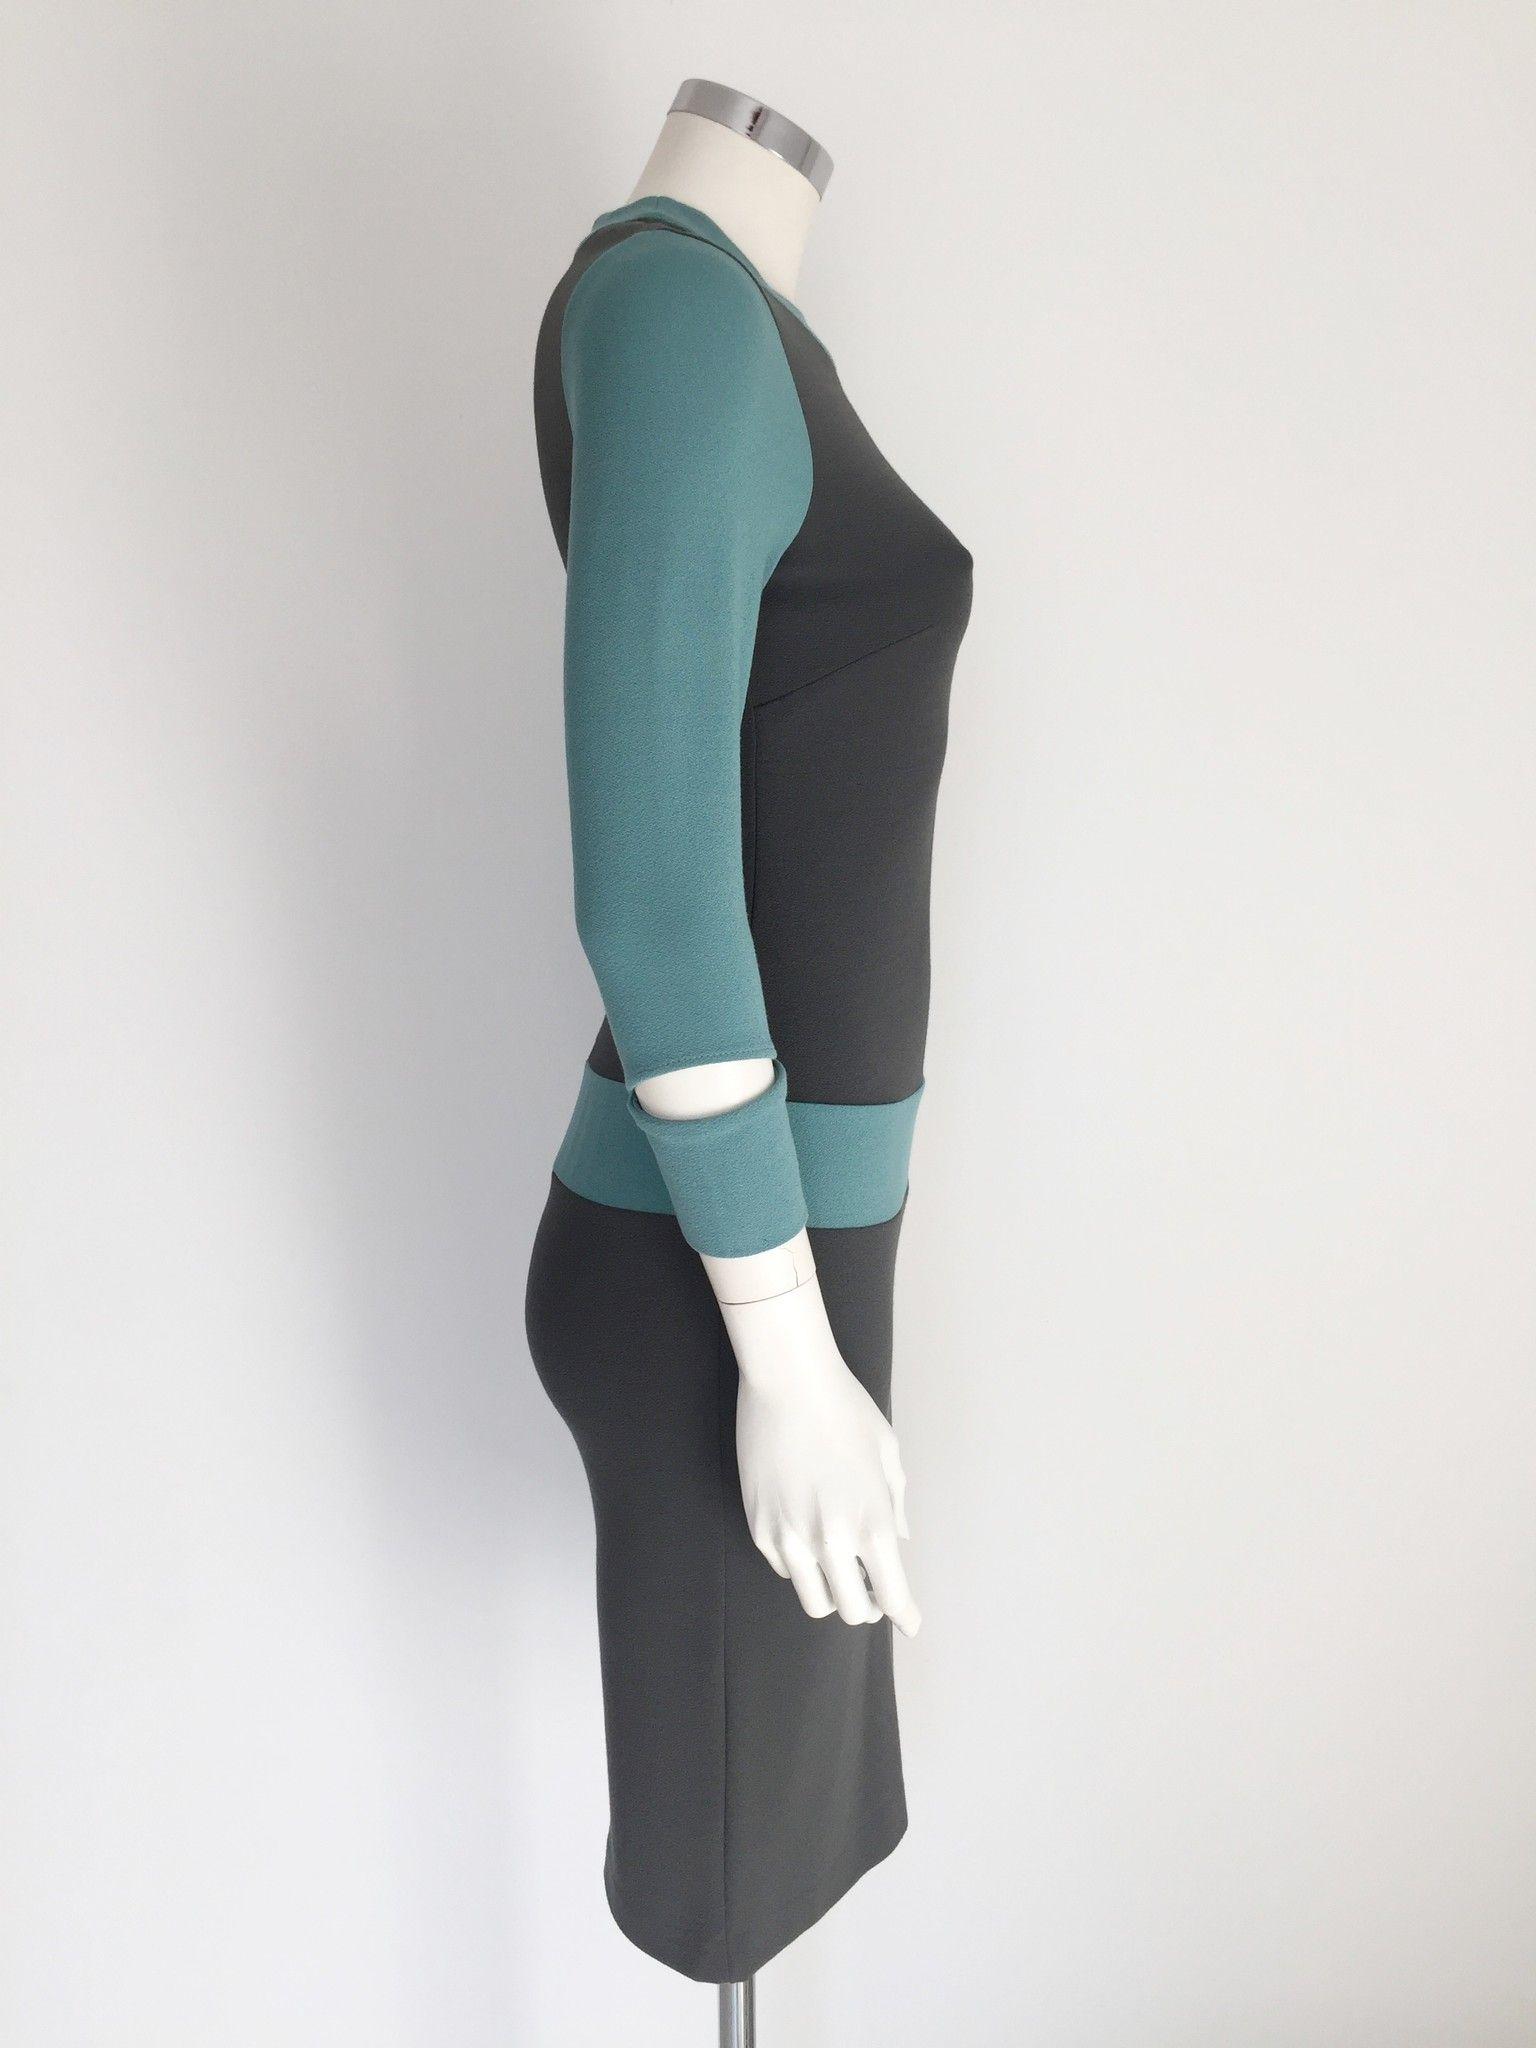 Adele Fado Two-Tone Dress Cod.6305PC